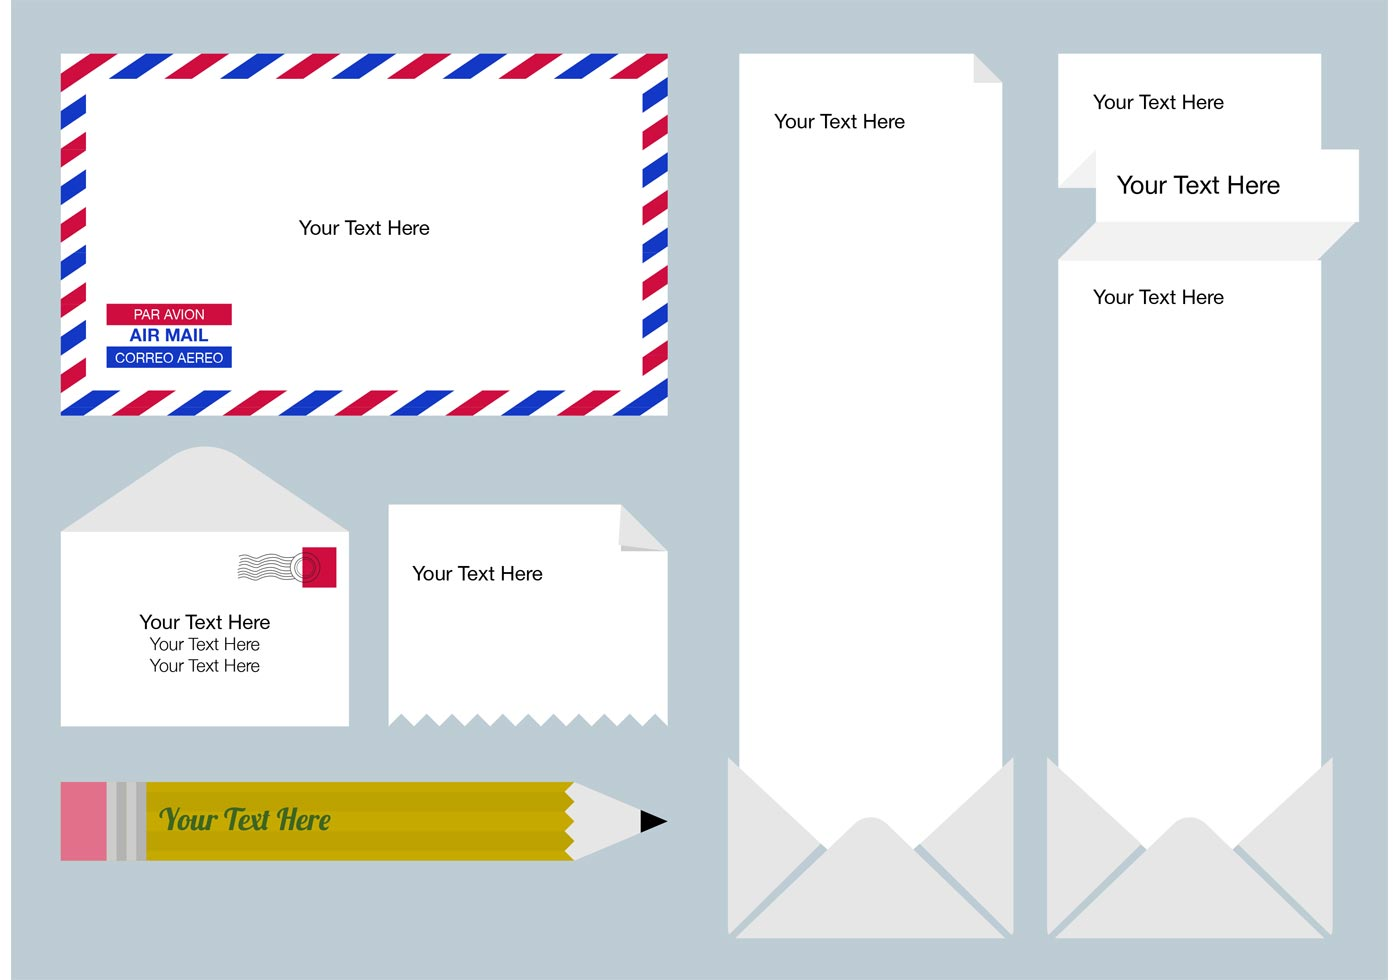 editable text box free vector art 9644 free downloads